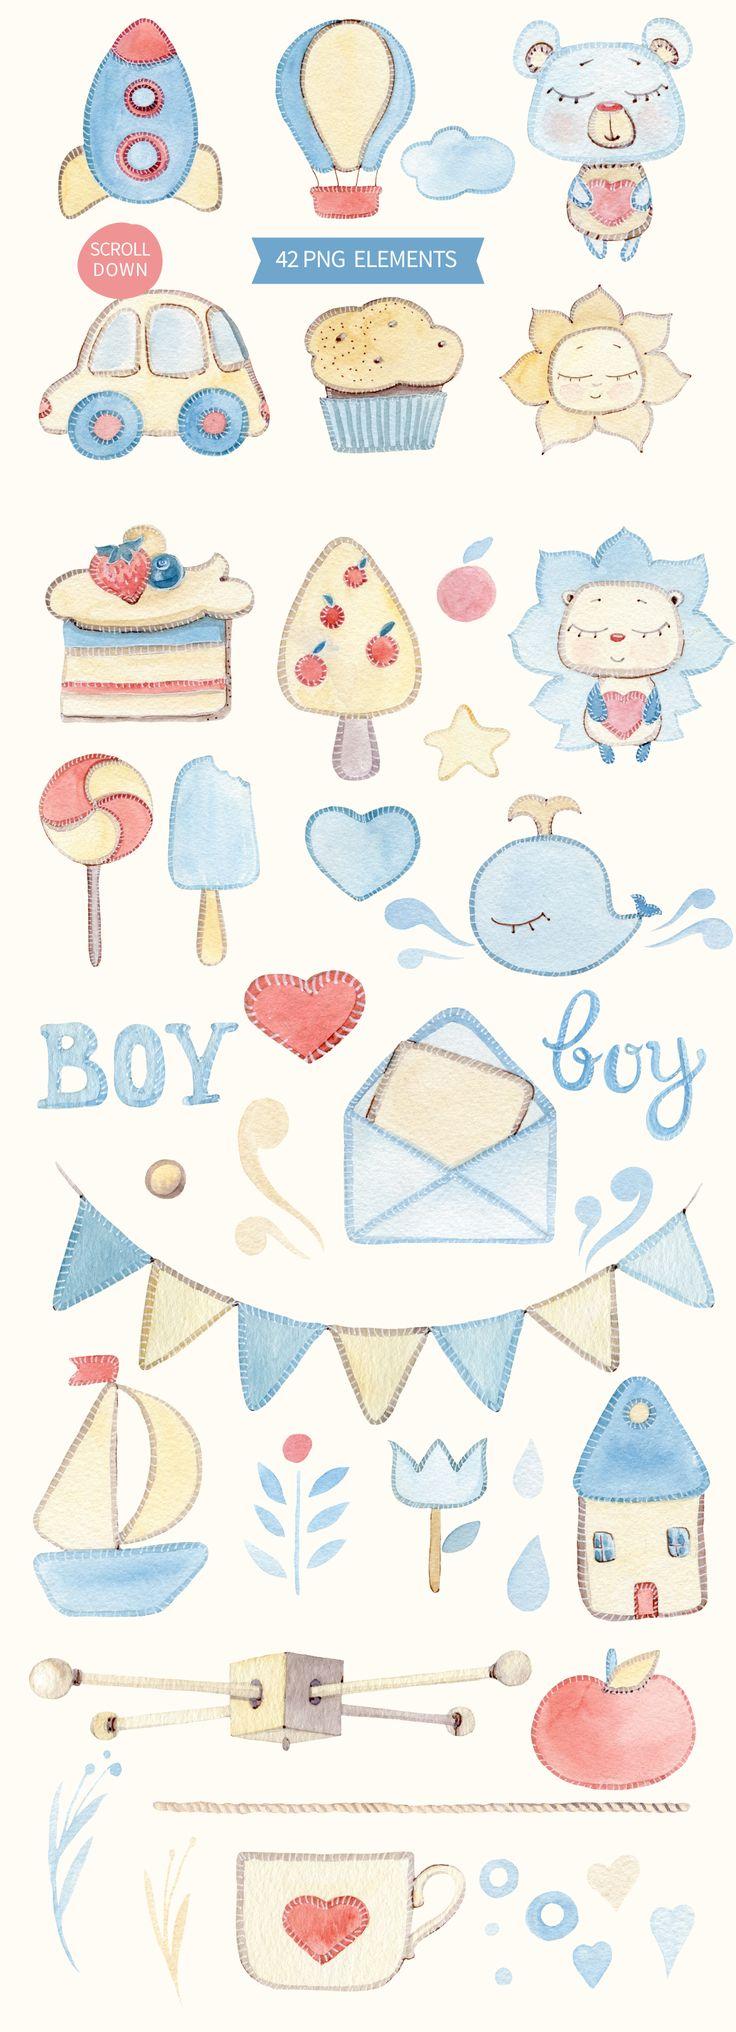 IT'S A BOY watercolor set by Lemaris on @creativemarket